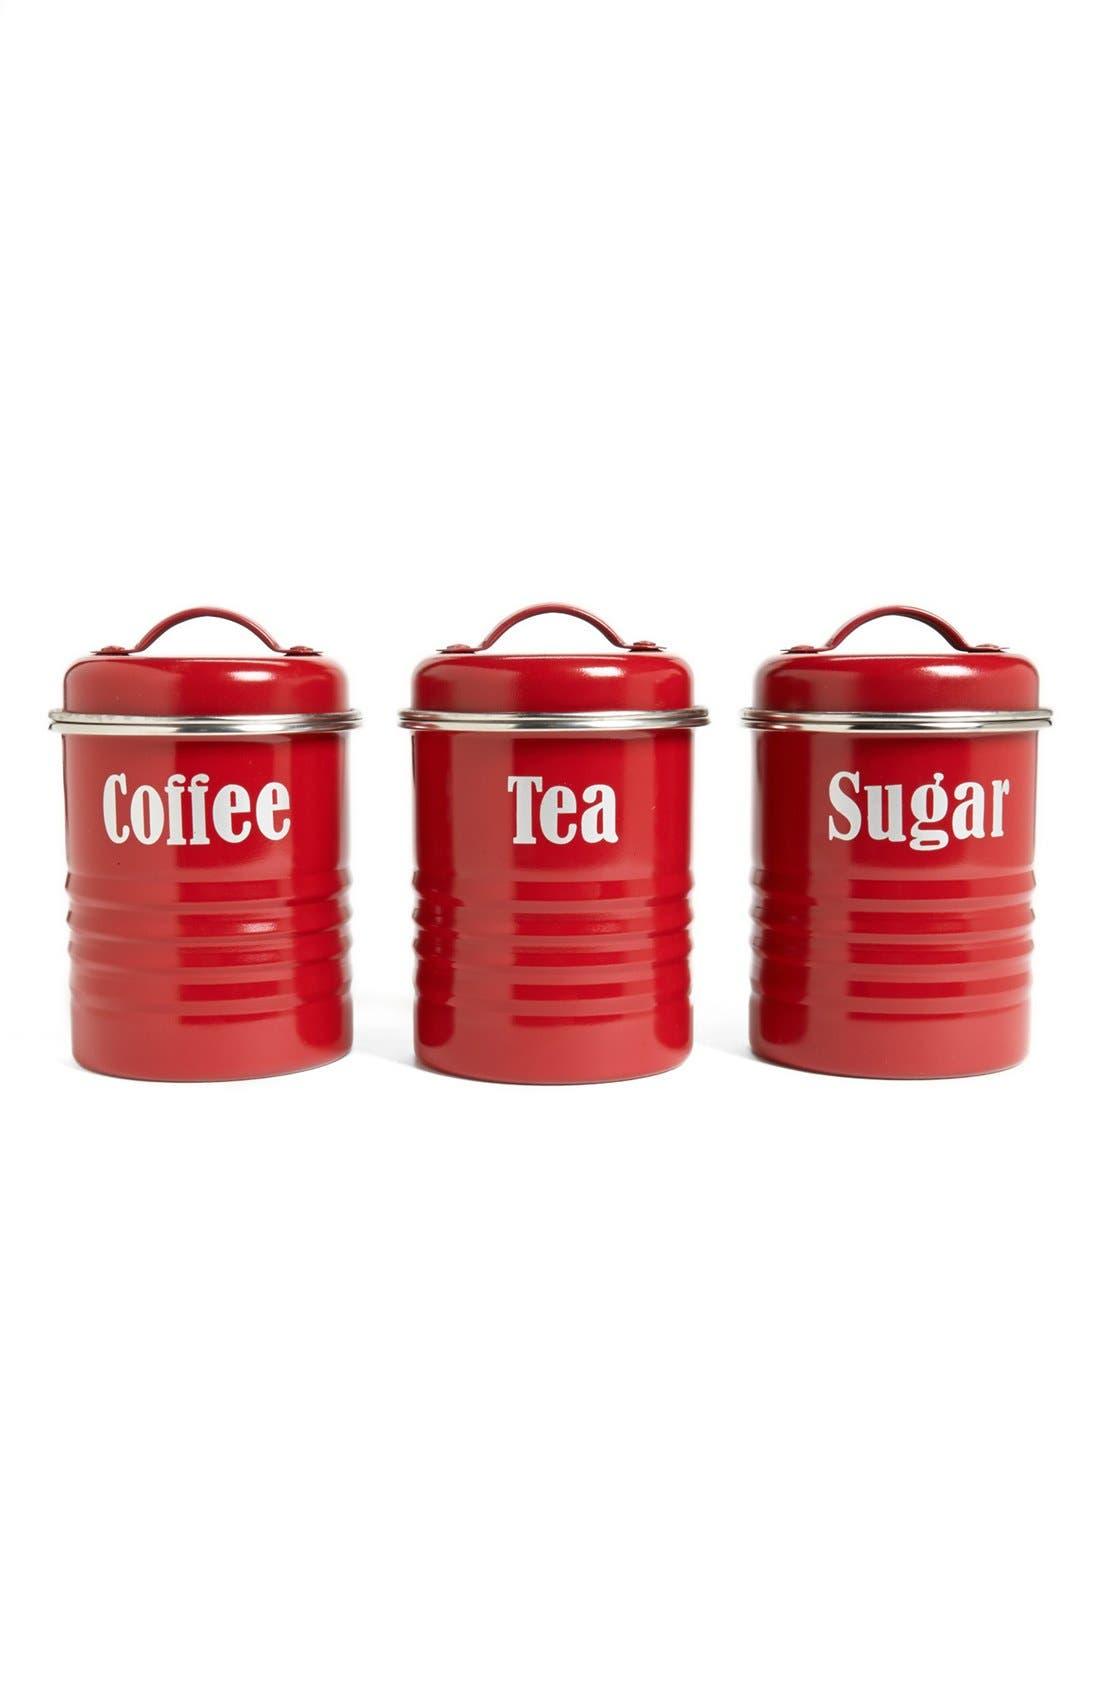 Alternate Image 1 Selected - Typhoon 'Vintage Kitchen' Enameled Tea, Coffee & Sugar Storage Canisters (Set of 3)